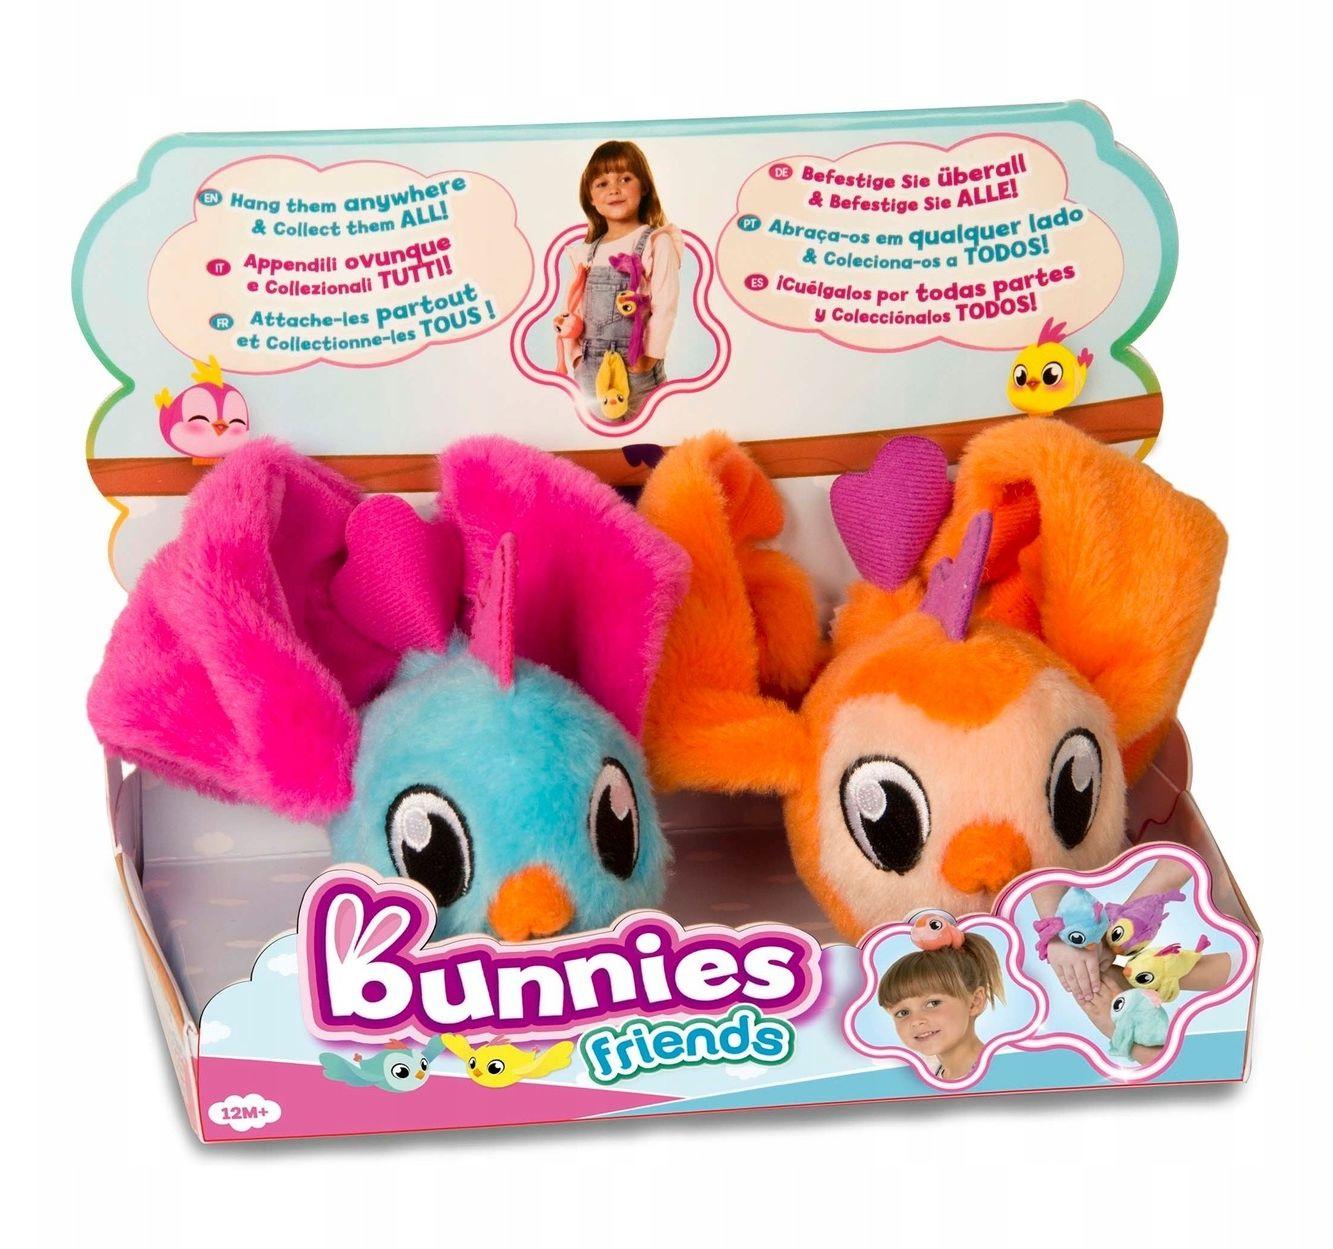 TM Toys Bunnies Love ptaszek magnetyczny zabawka, pluszak 2-pak